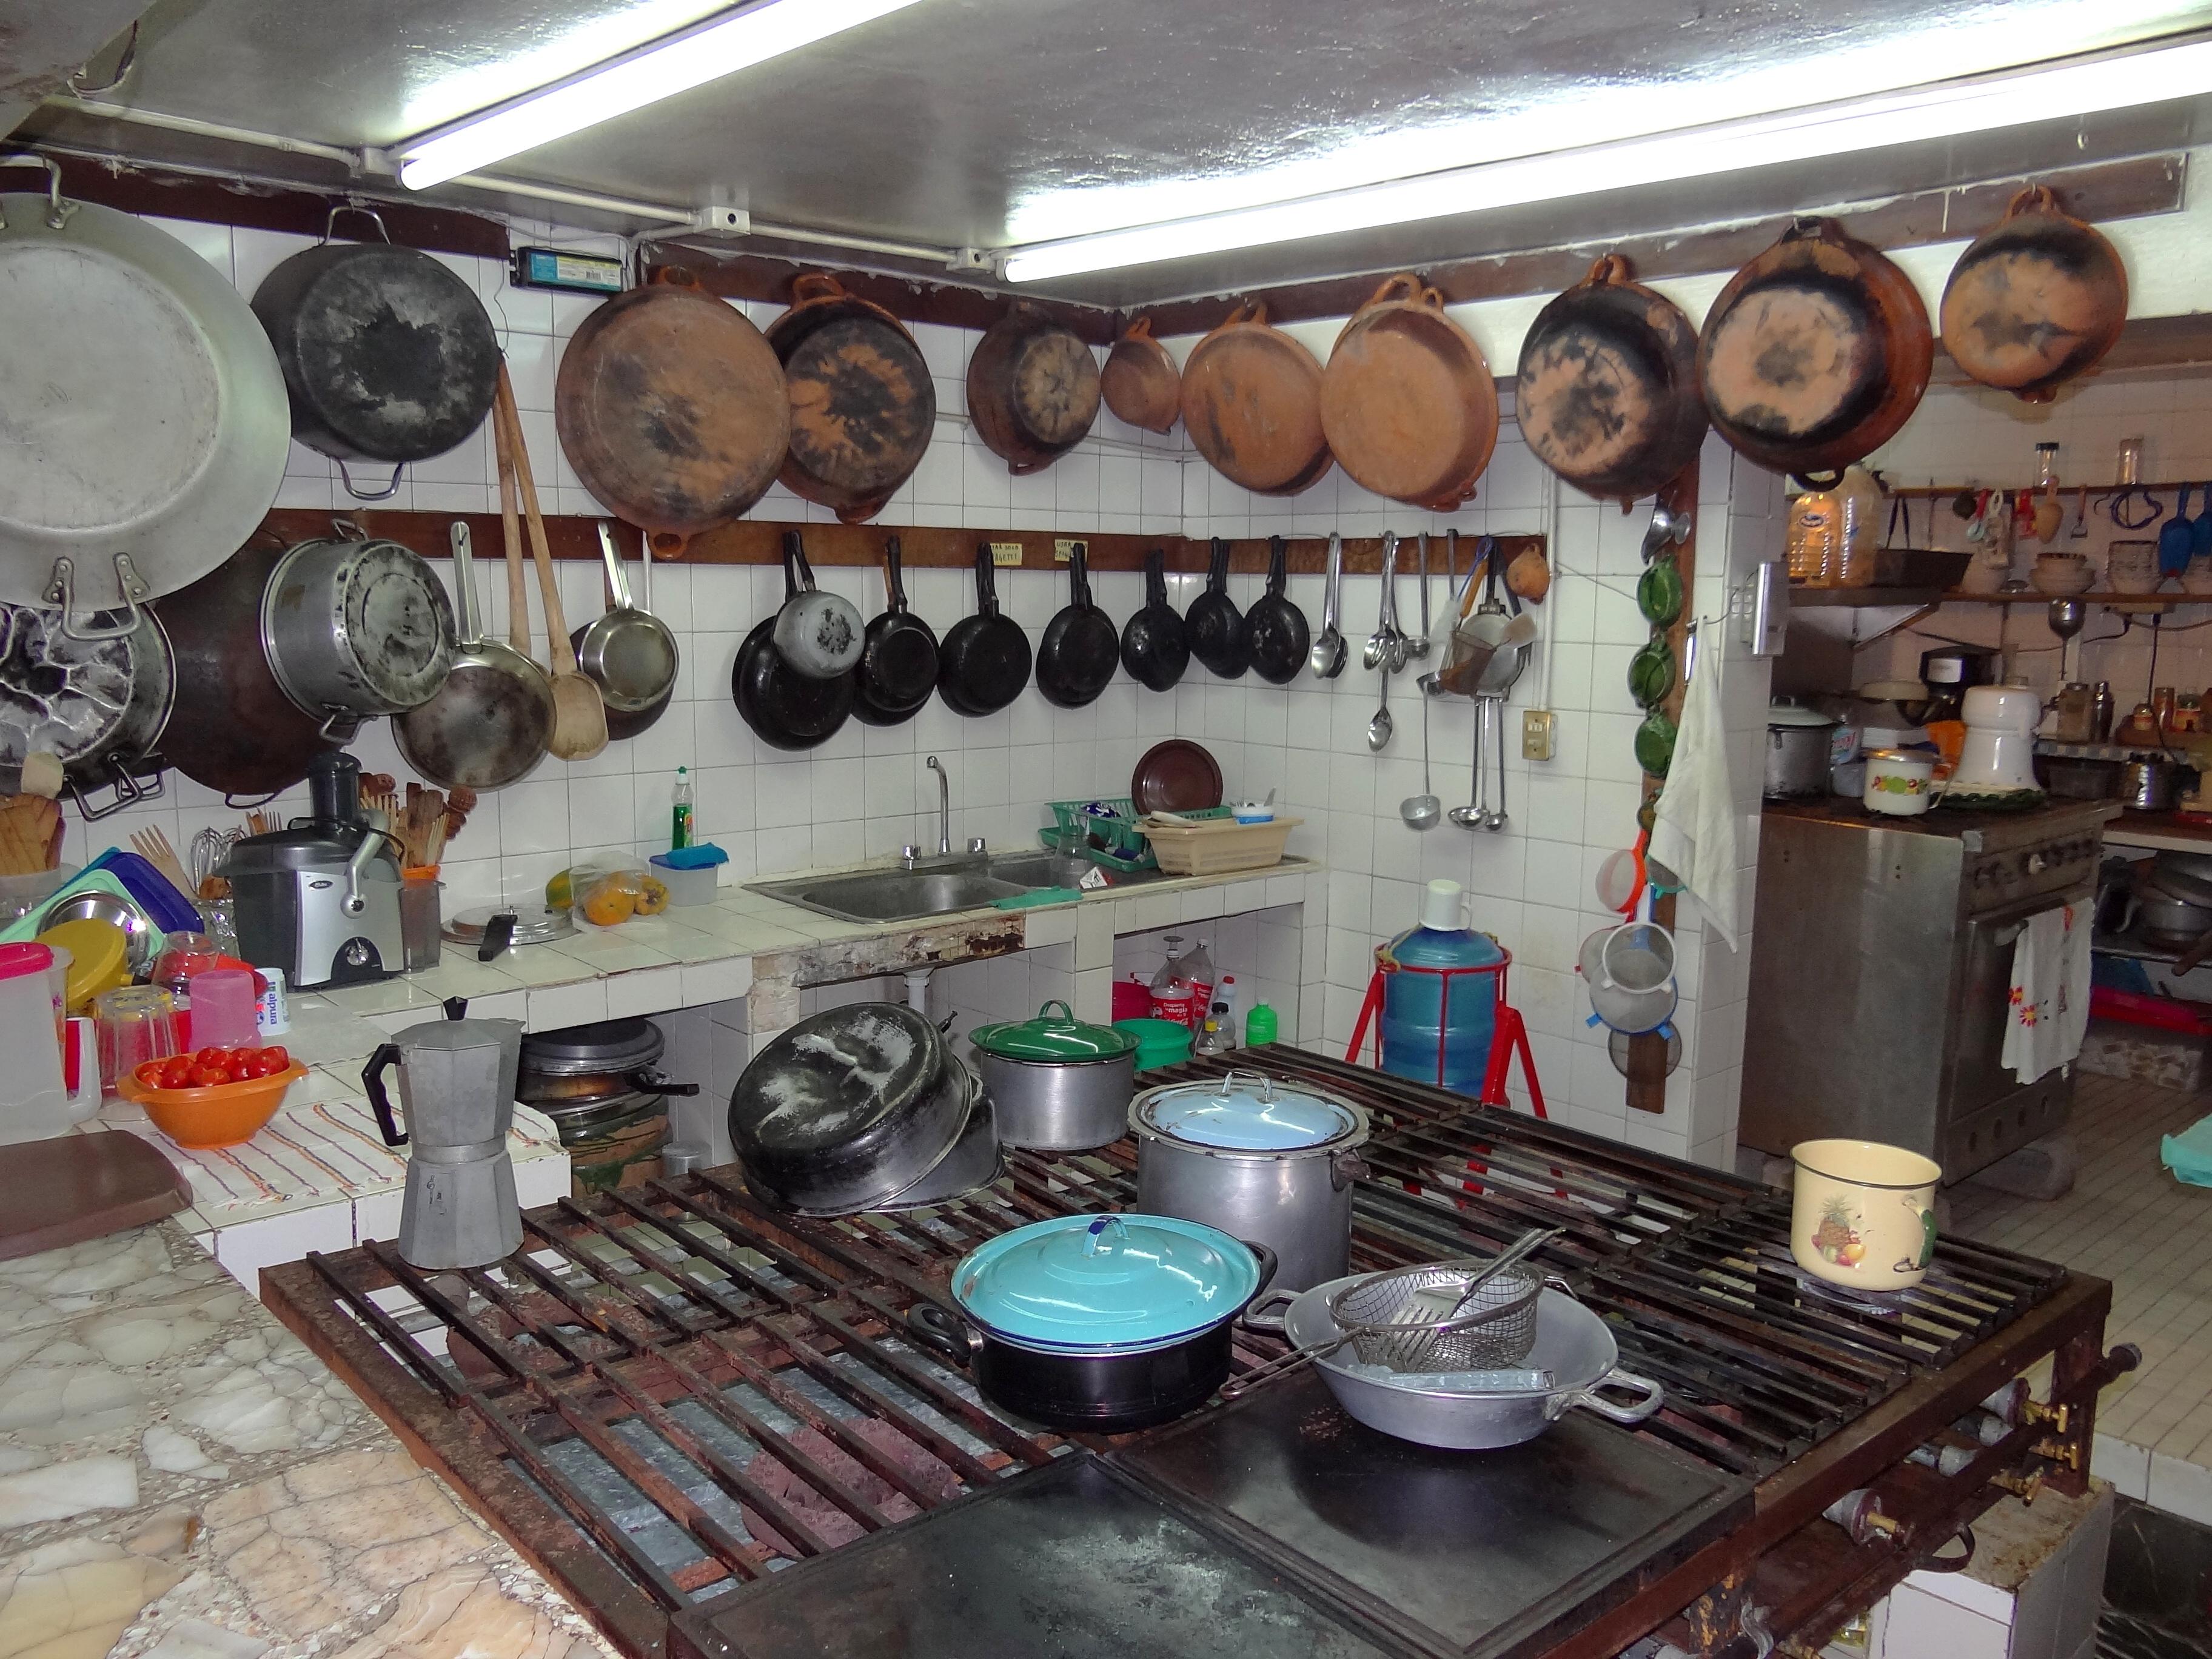 File:A Mexican Kitchen   Hotel Villa Florencia   Puerto Angel   Oaxaca    Mexico (6522741095)